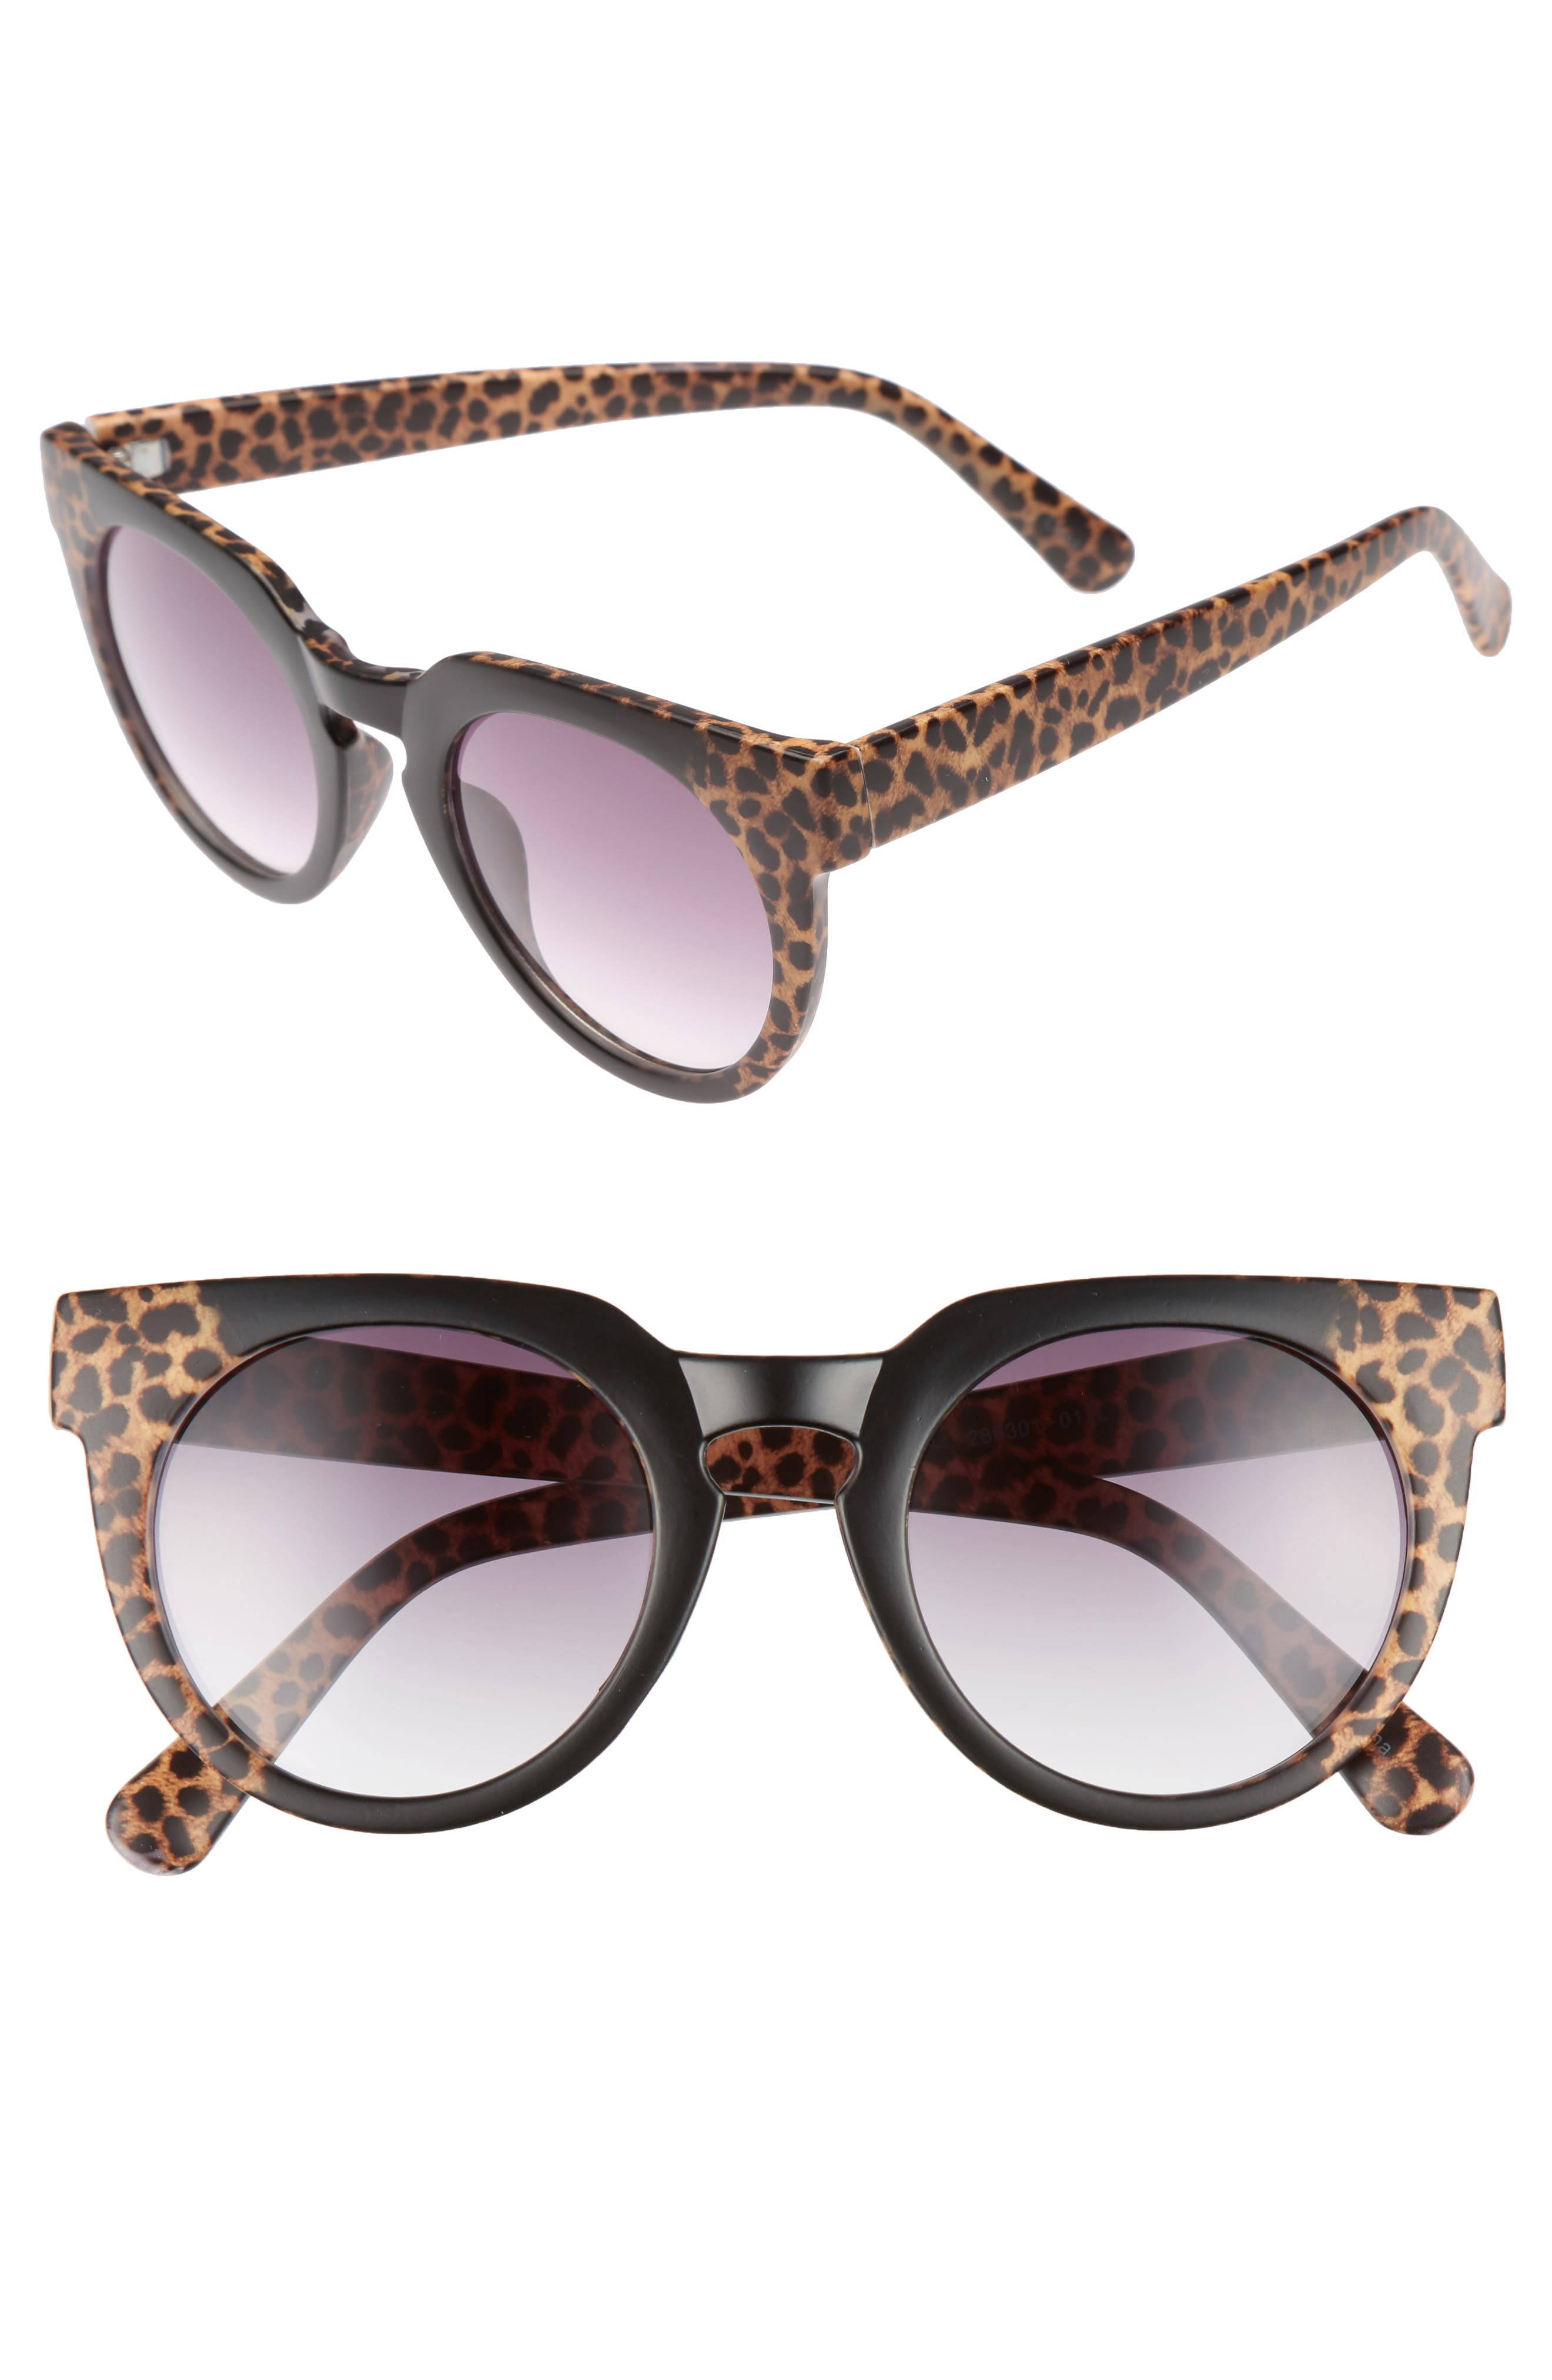 47mm Animal Print Round Sunglasses,                             Main thumbnail 1, color,                             001